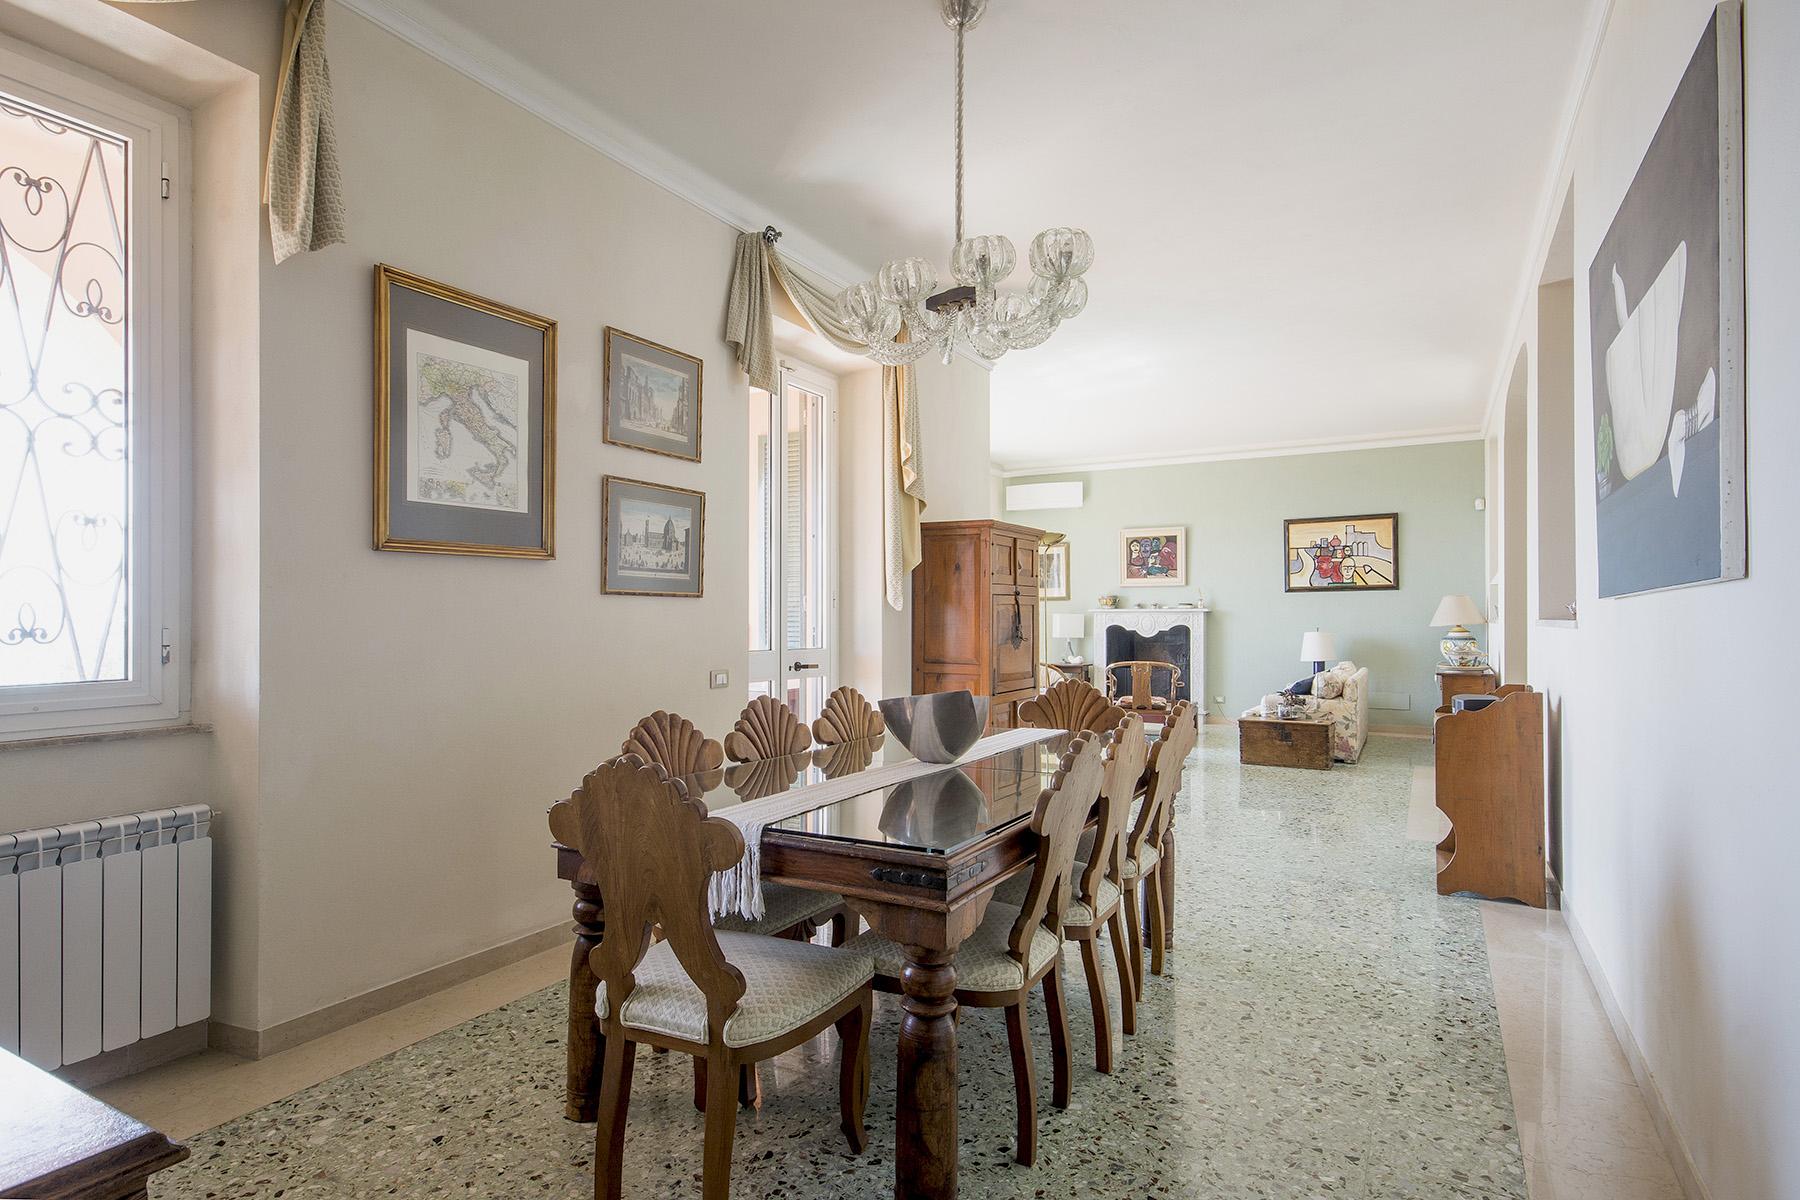 Villa in Vendita a Lerici: 5 locali, 580 mq - Foto 13